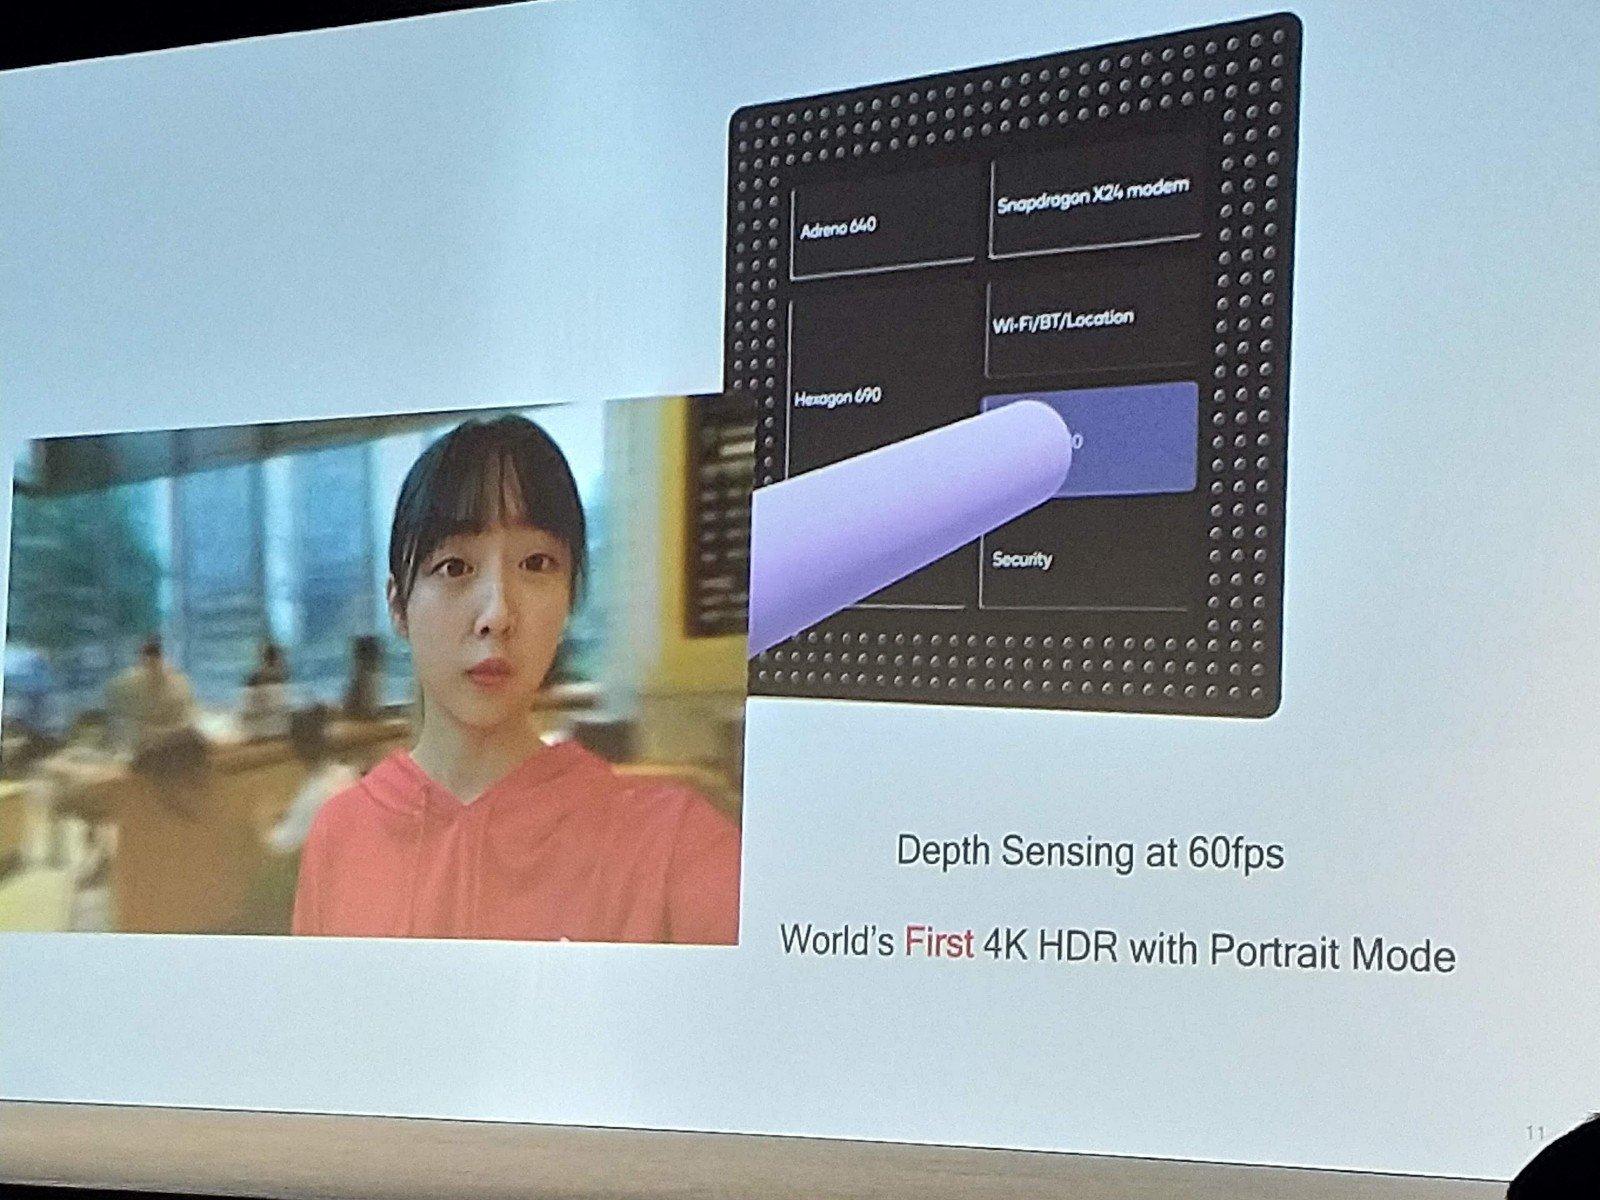 4K 60fps HDR videolarda Bokeh efekti kullanmaya ne dersiniz?